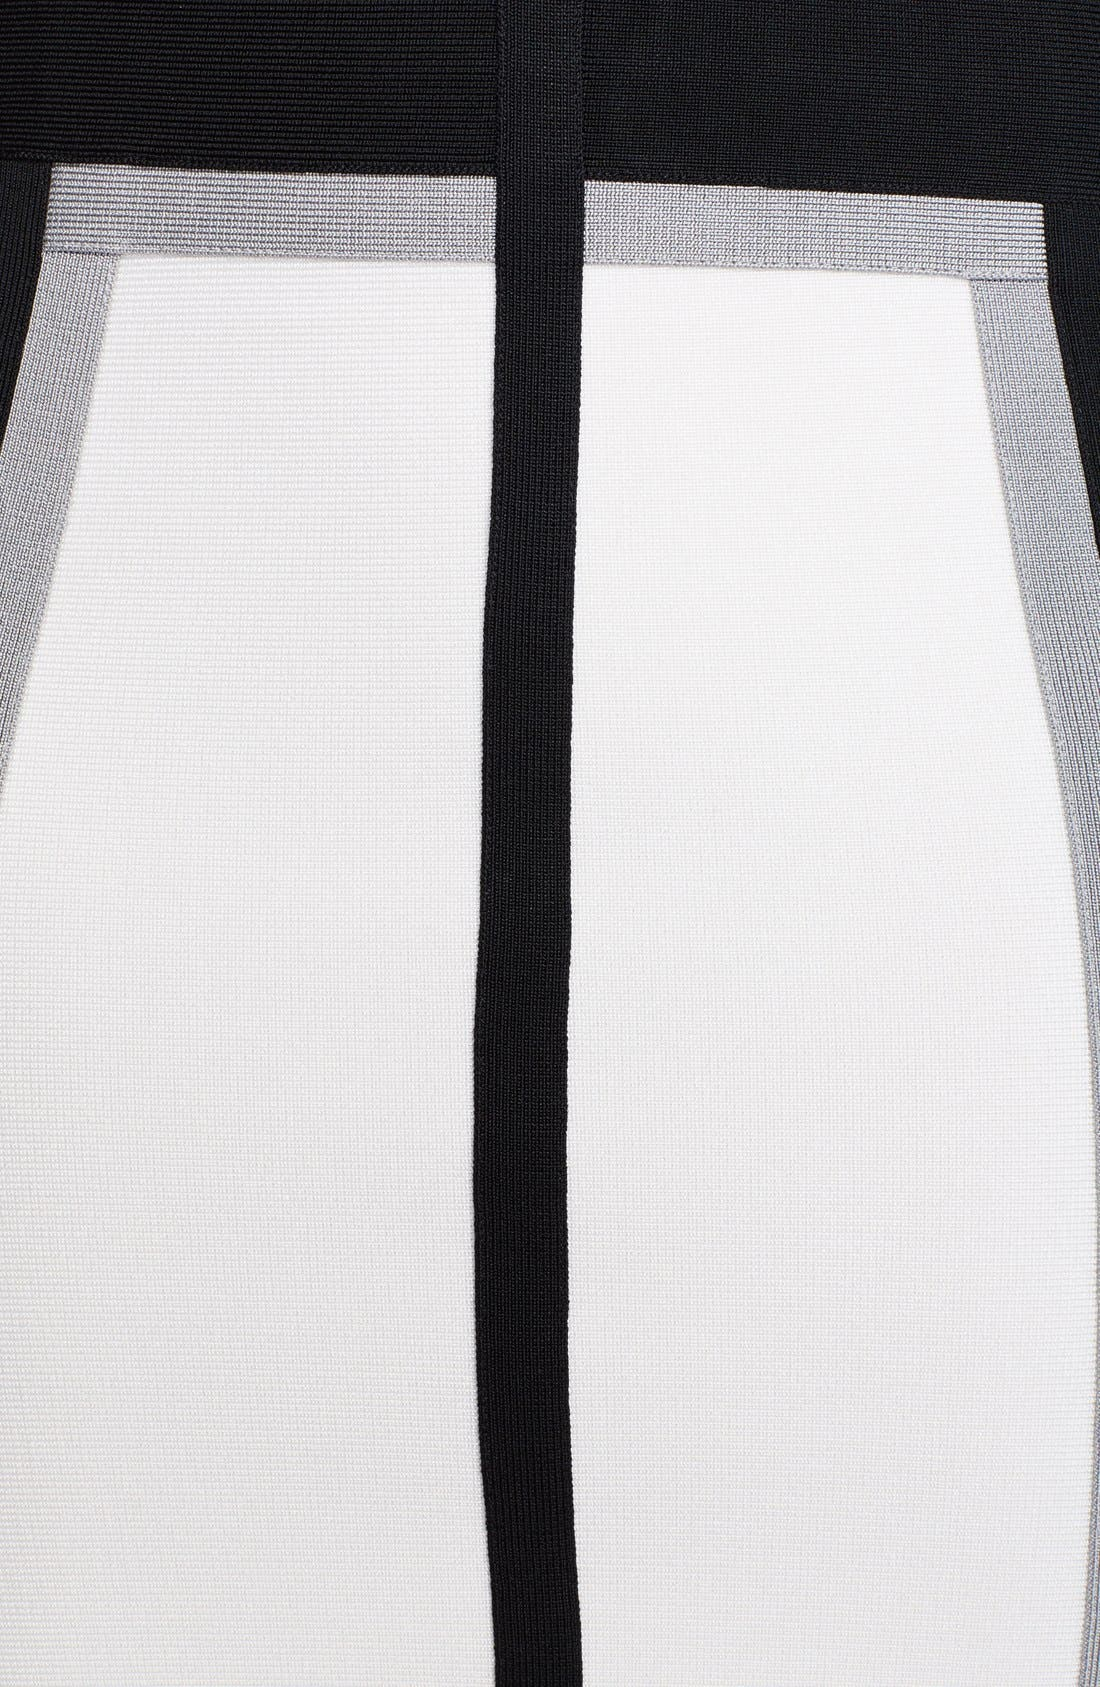 Alternate Image 3  - Herve Leger Zip Detail Pencil Dress